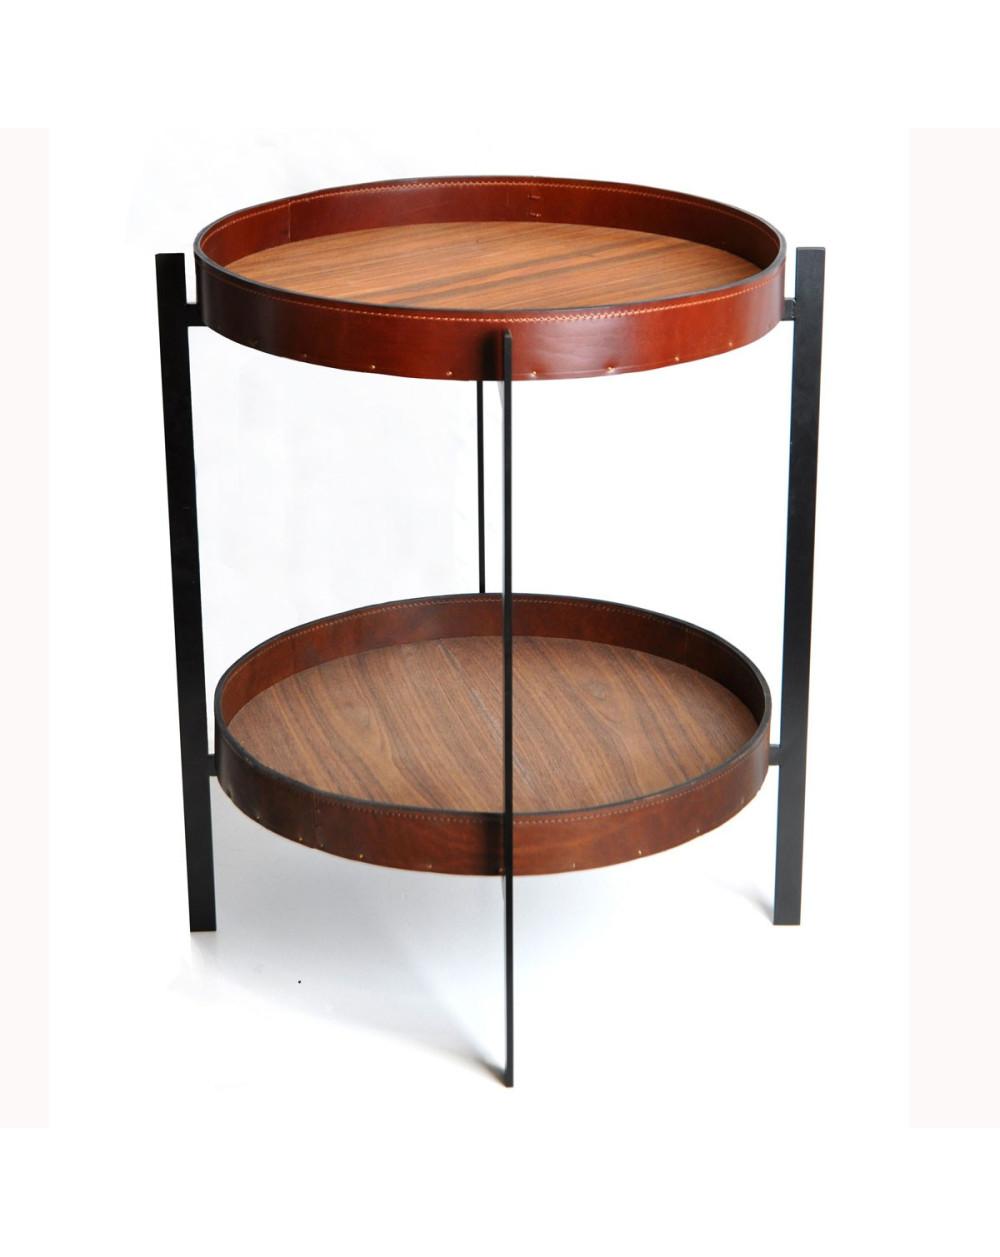 Table Deck, Dennis Marquart